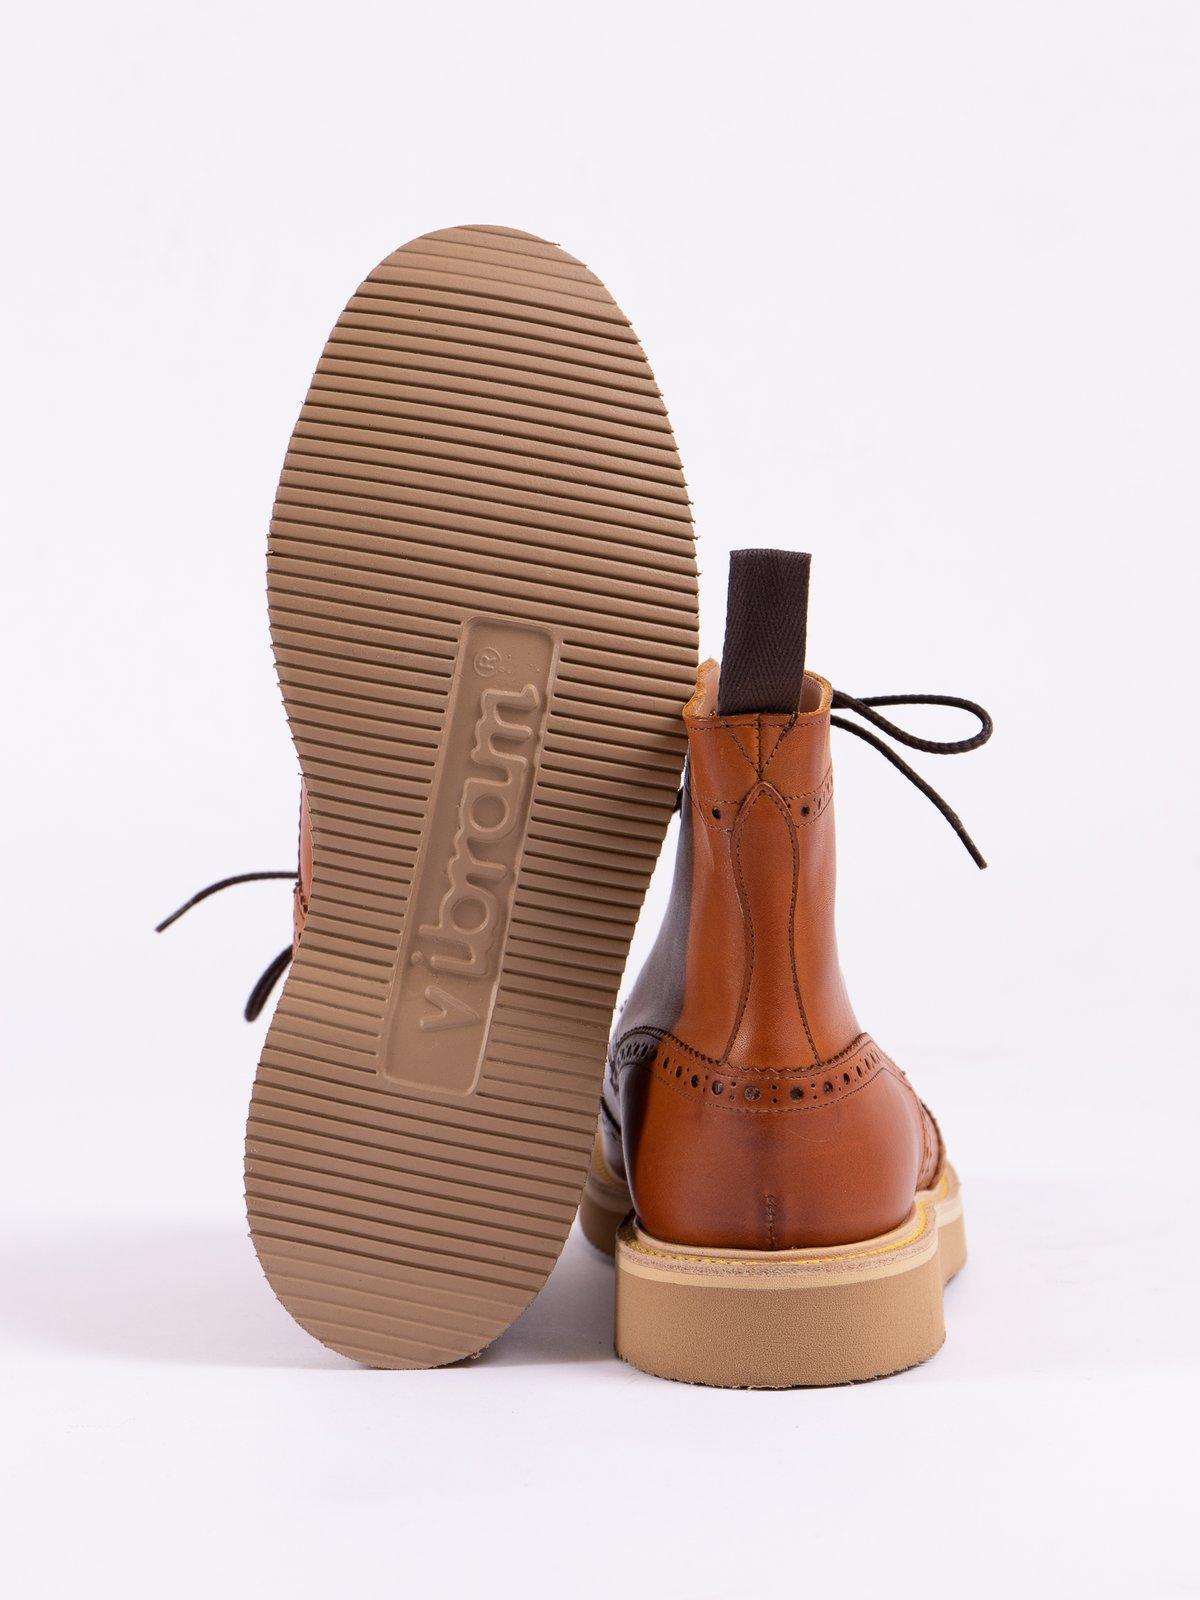 Acorn Funchal Brogue Stow Boot - Image 5